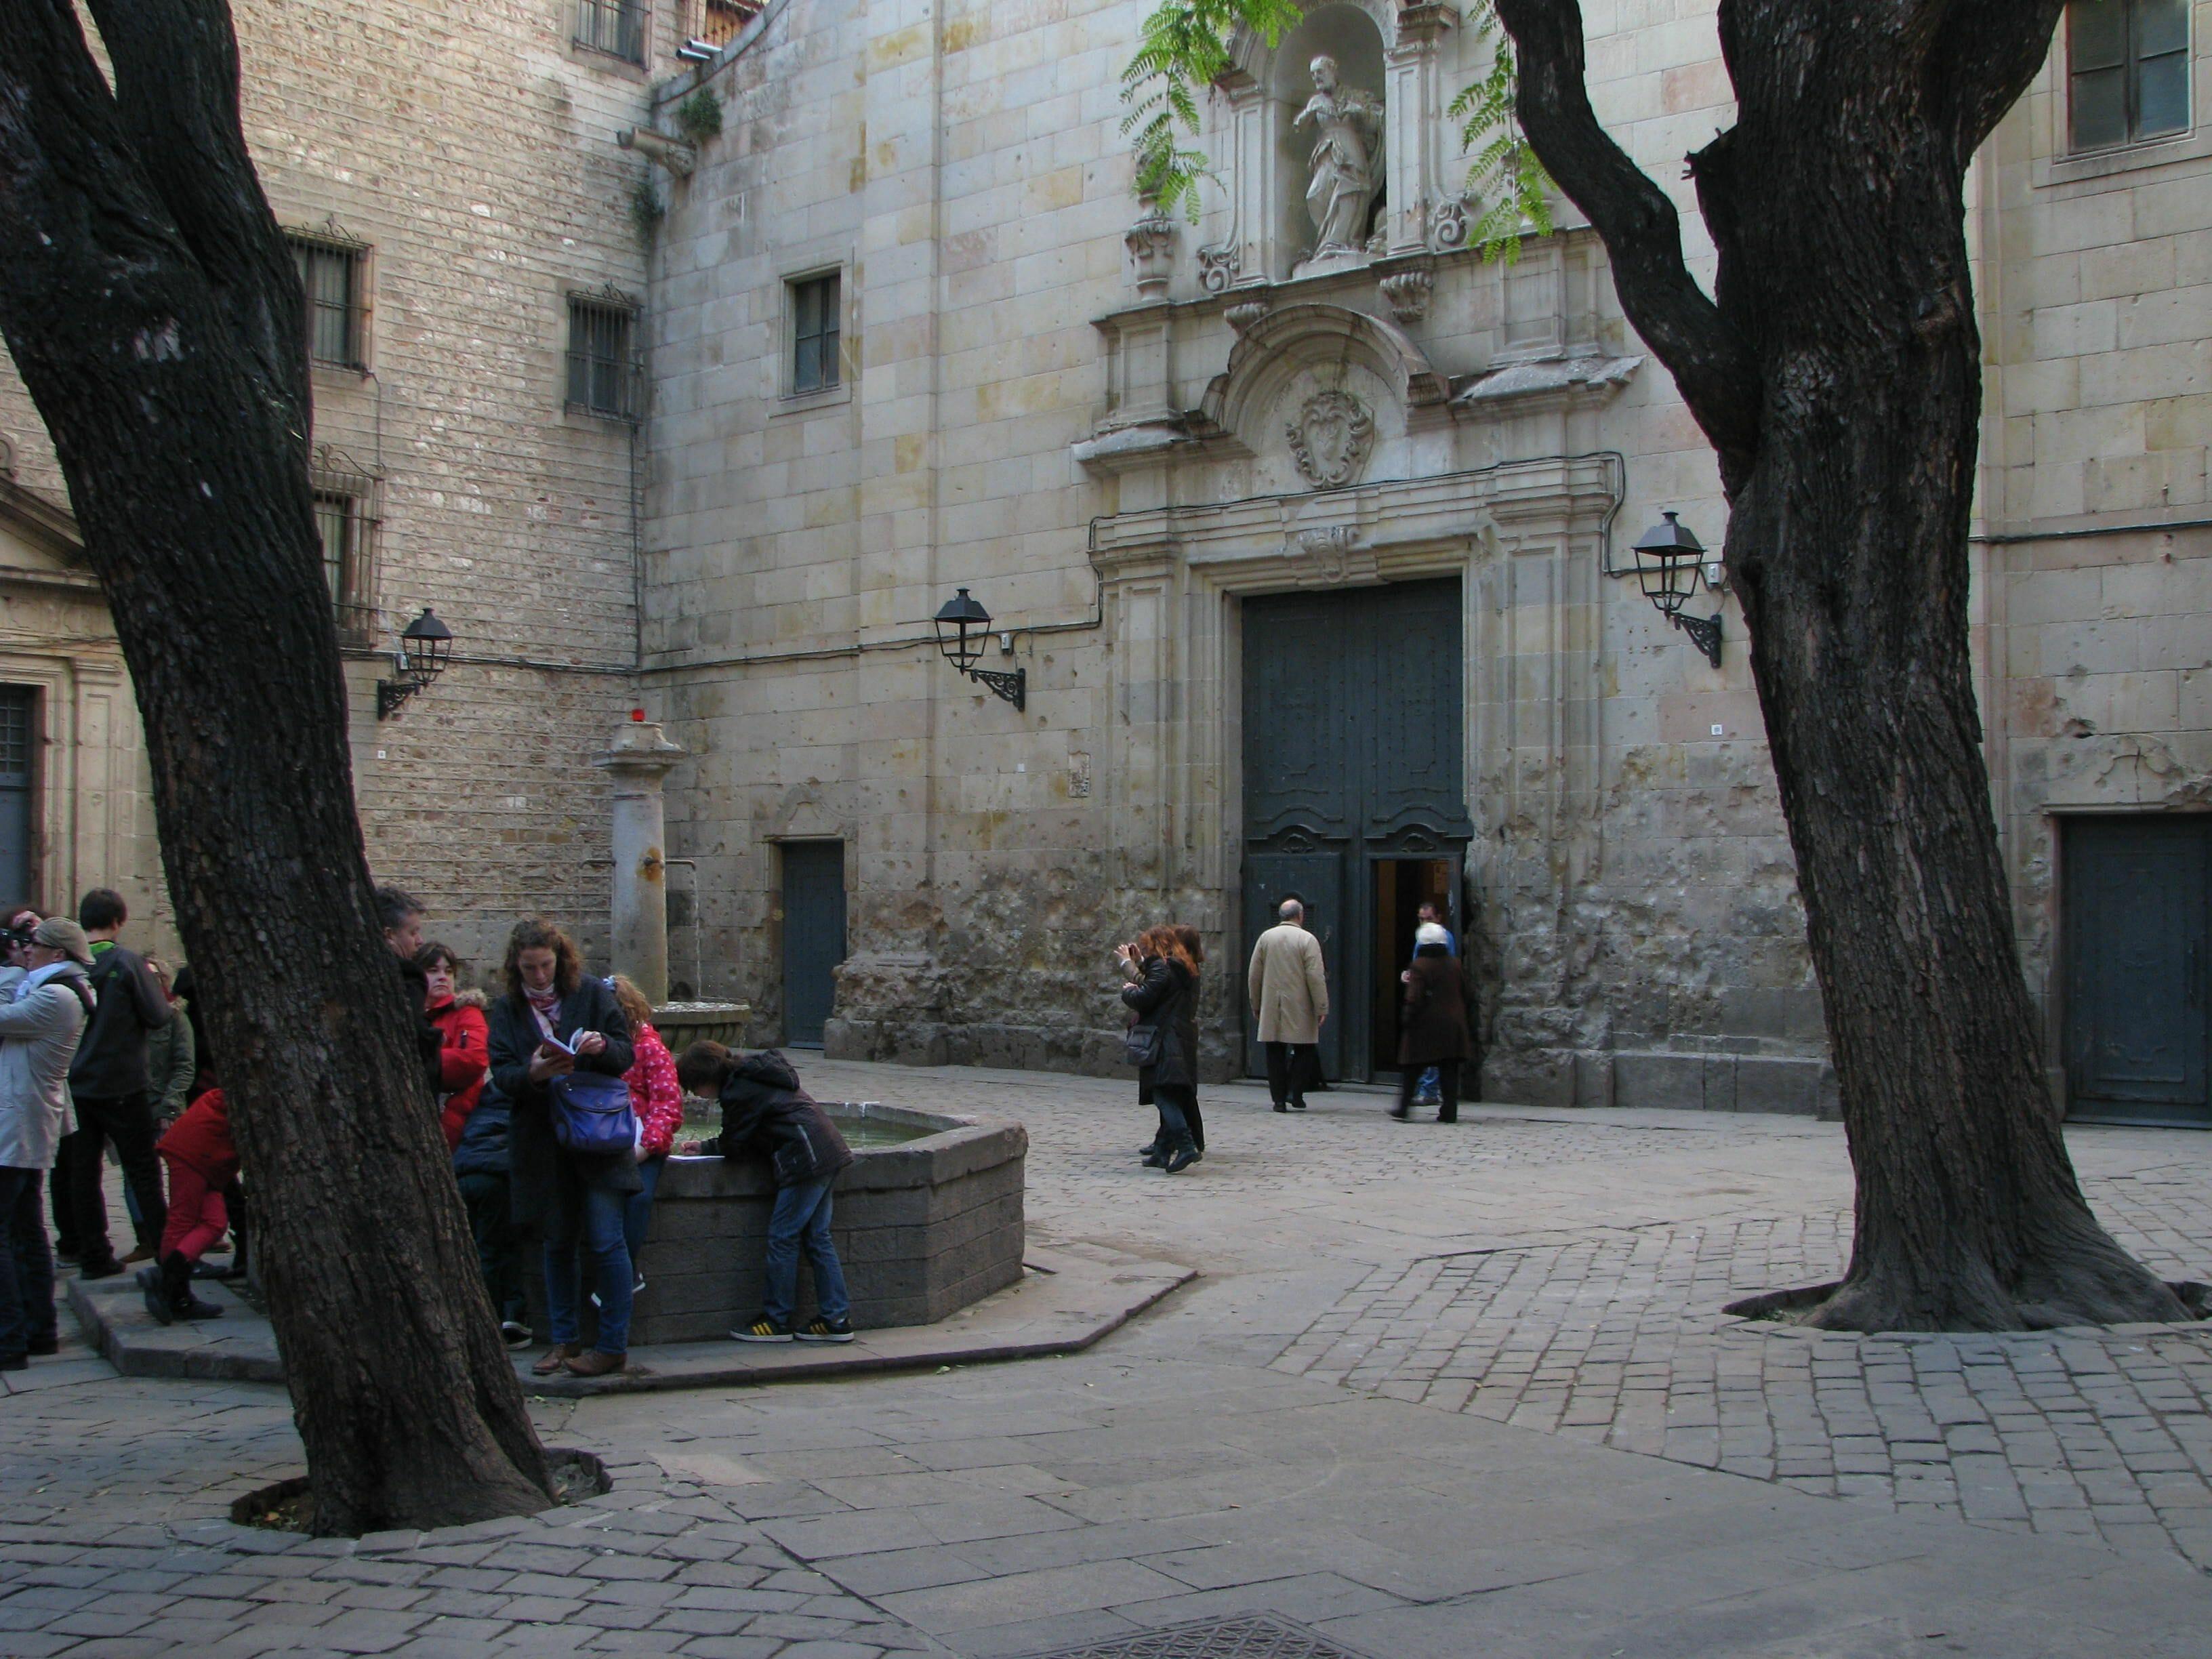 20 rincones mágicos del Barri Gòtic de Barcelona (I)